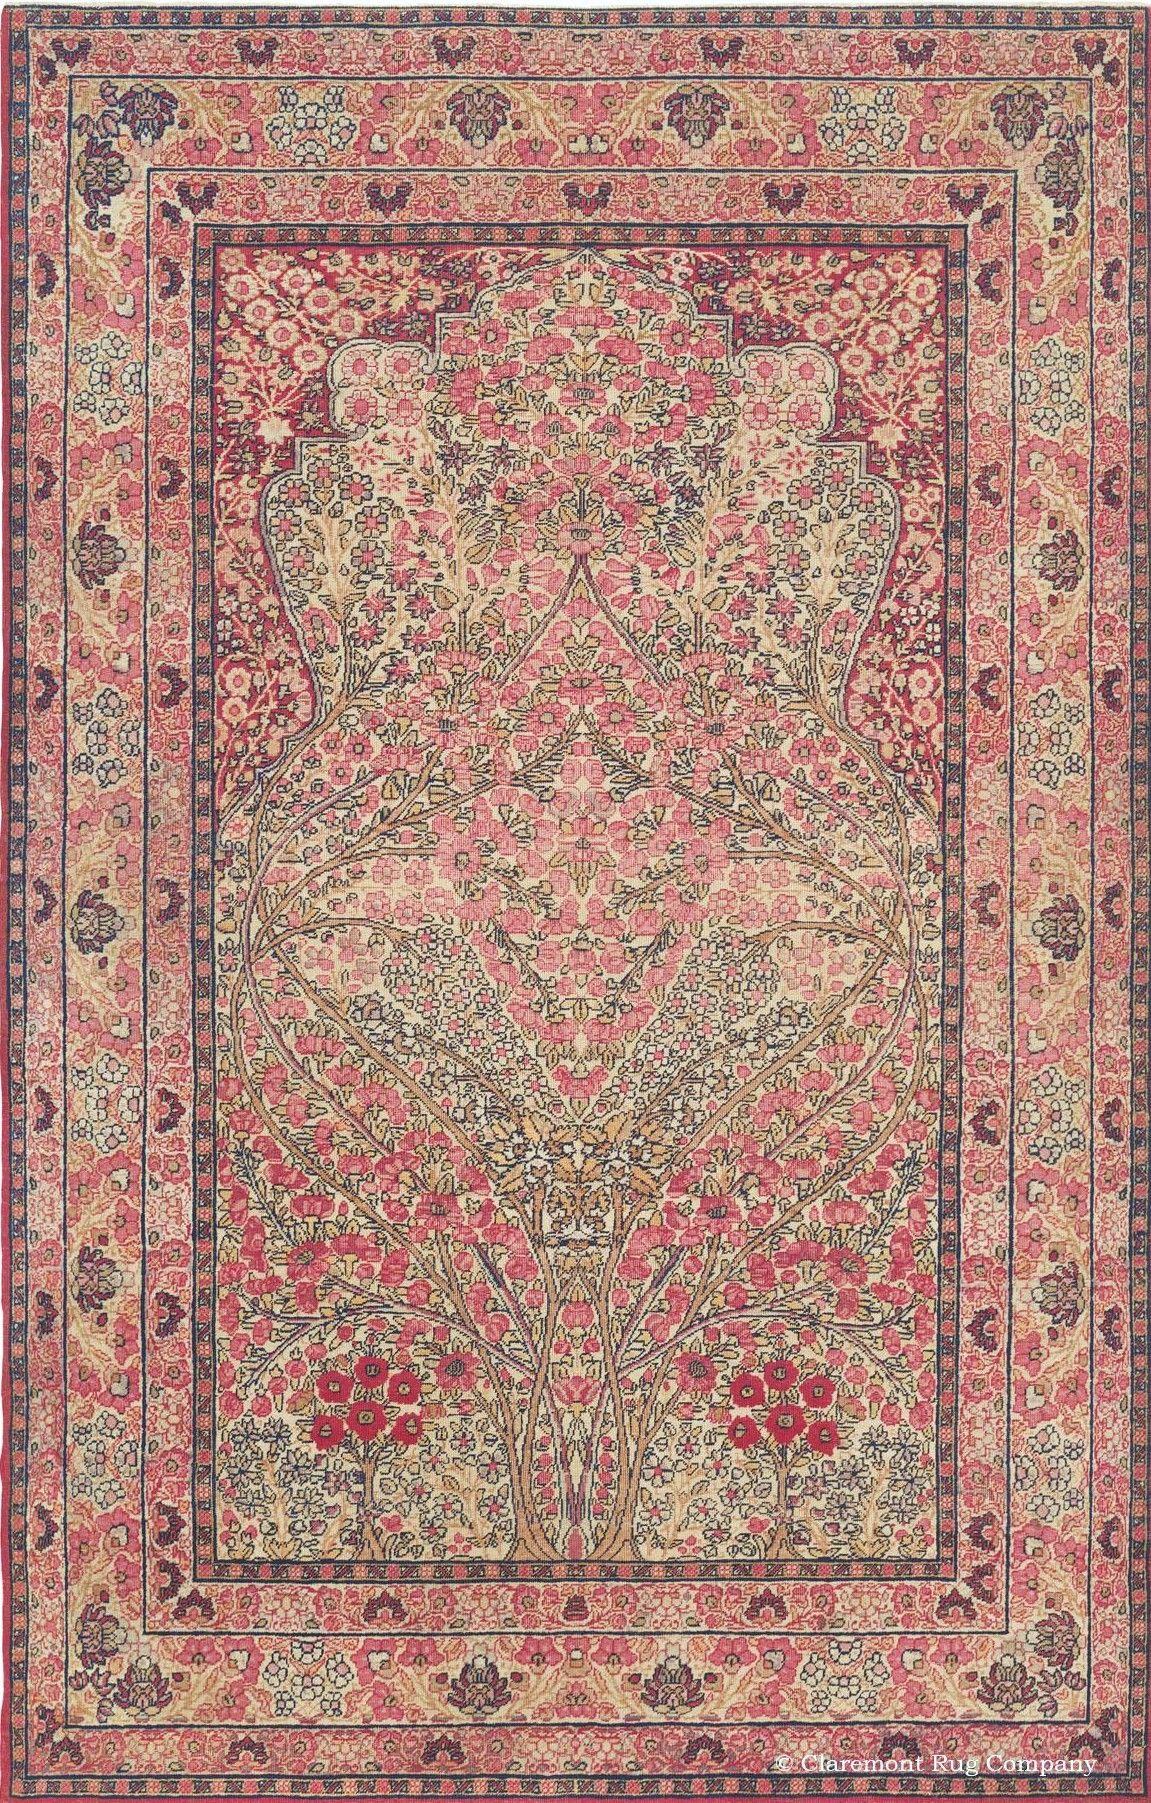 Persian Kerman Laver rug, 9ft 10in x 12ft 4in, circa 1900, Claremont gallery